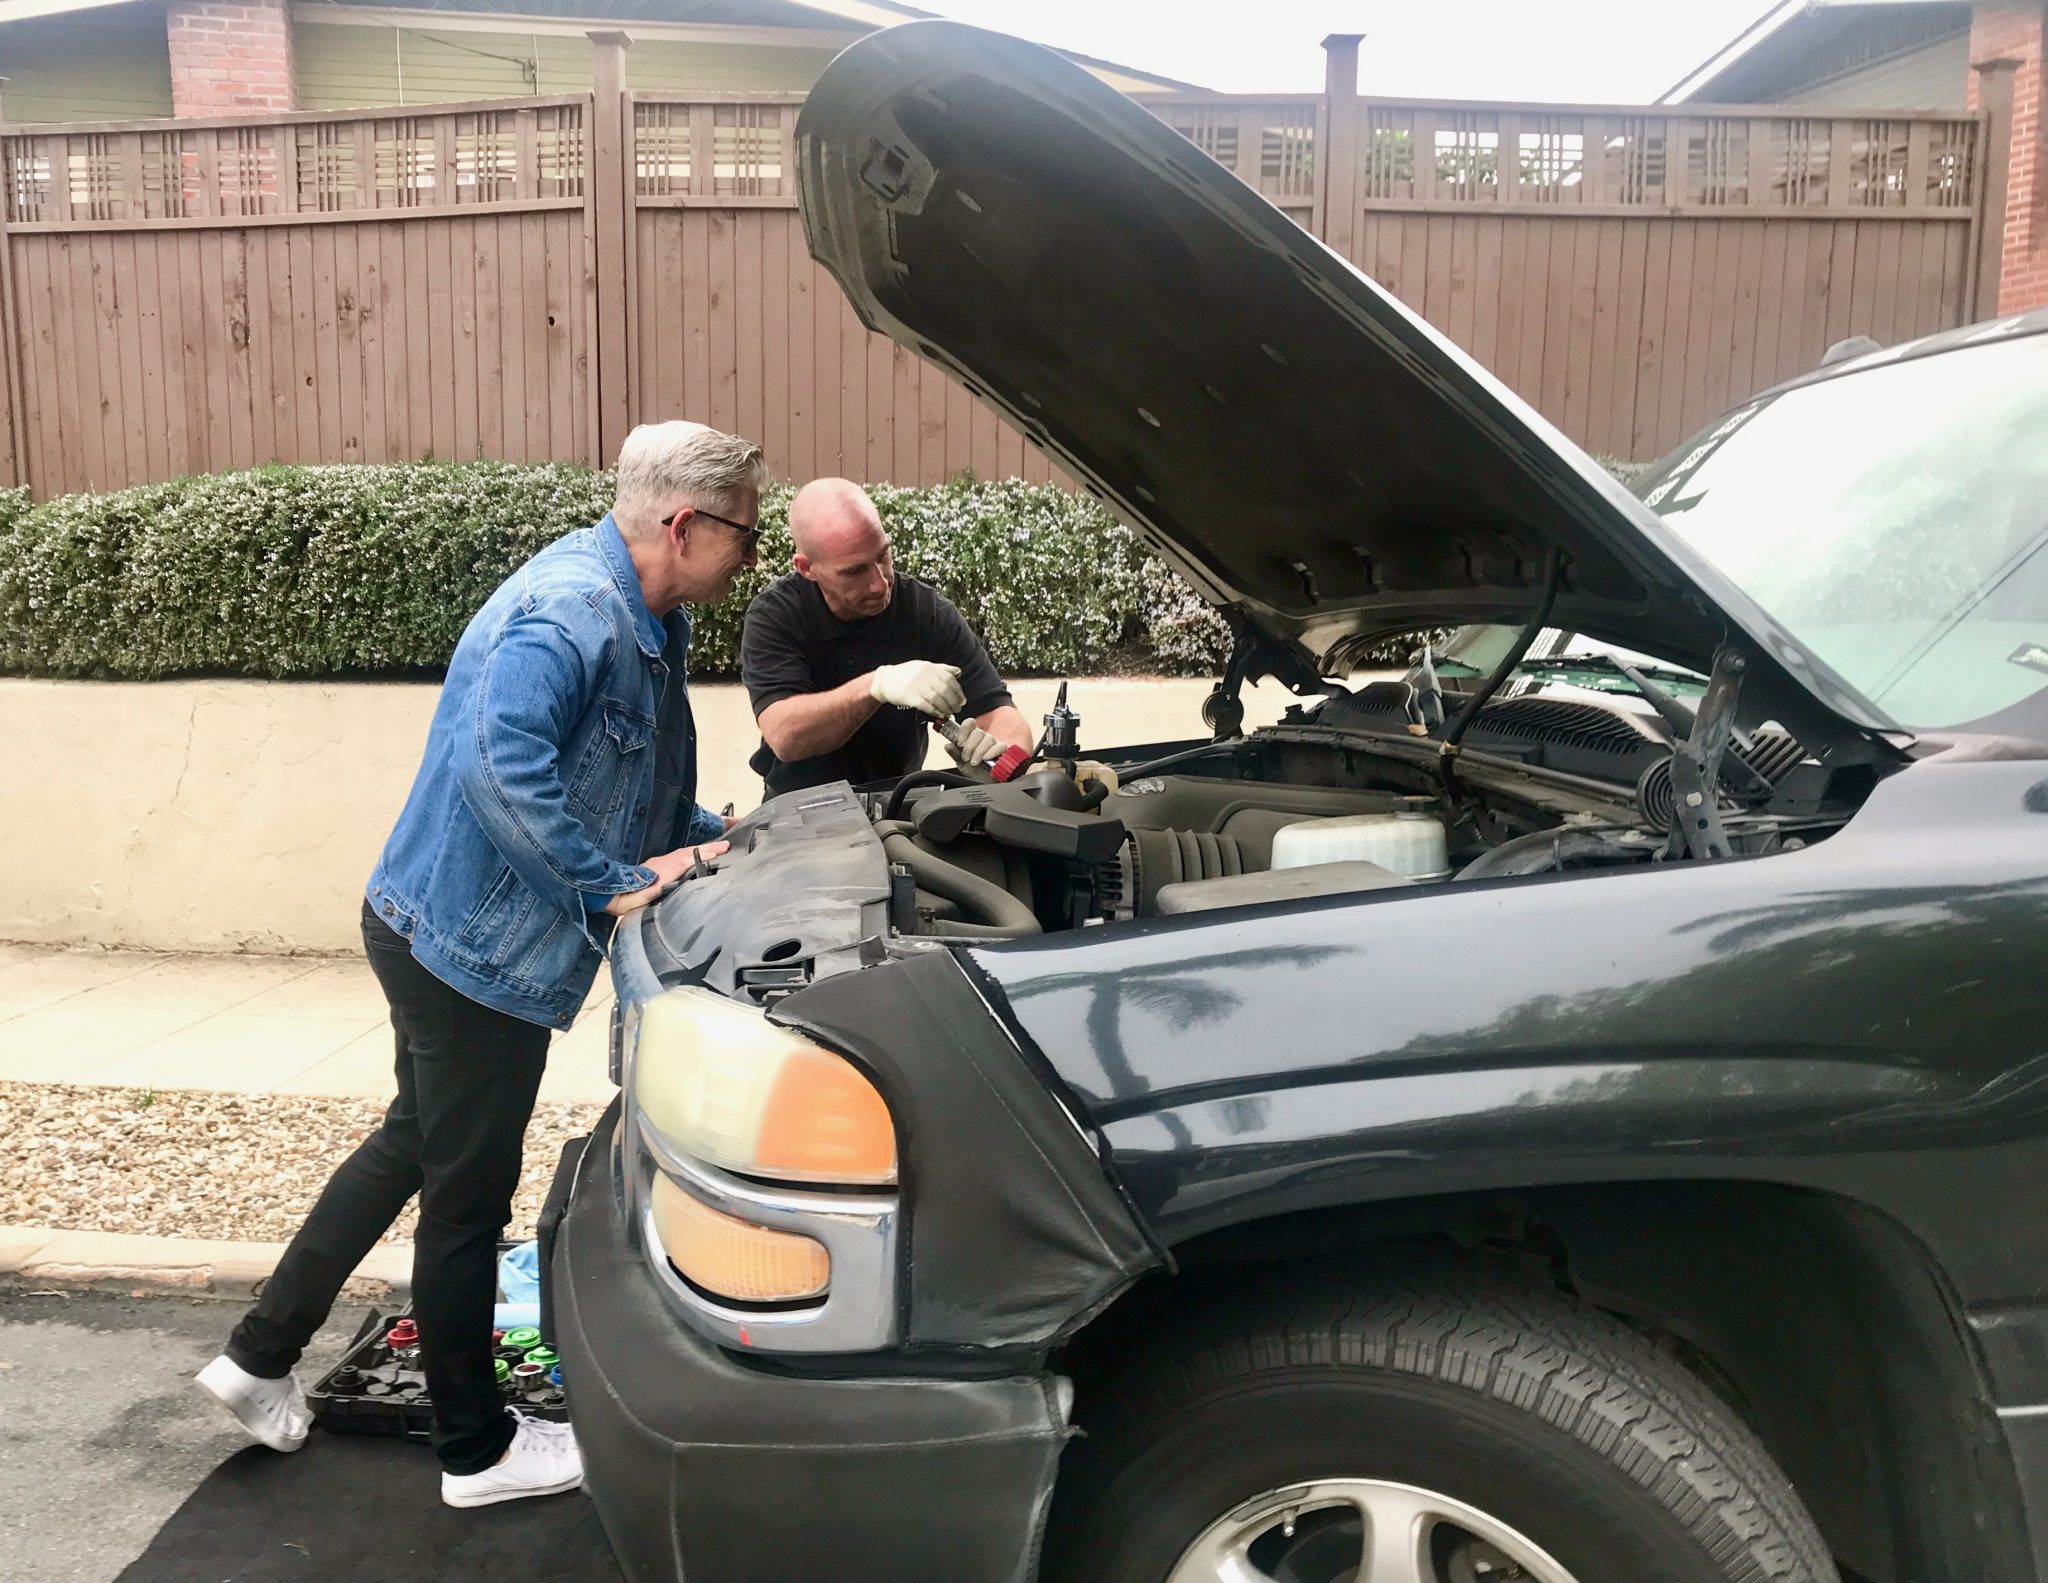 RepairSmith Brings Mobile Auto Repair to Your Doorstep